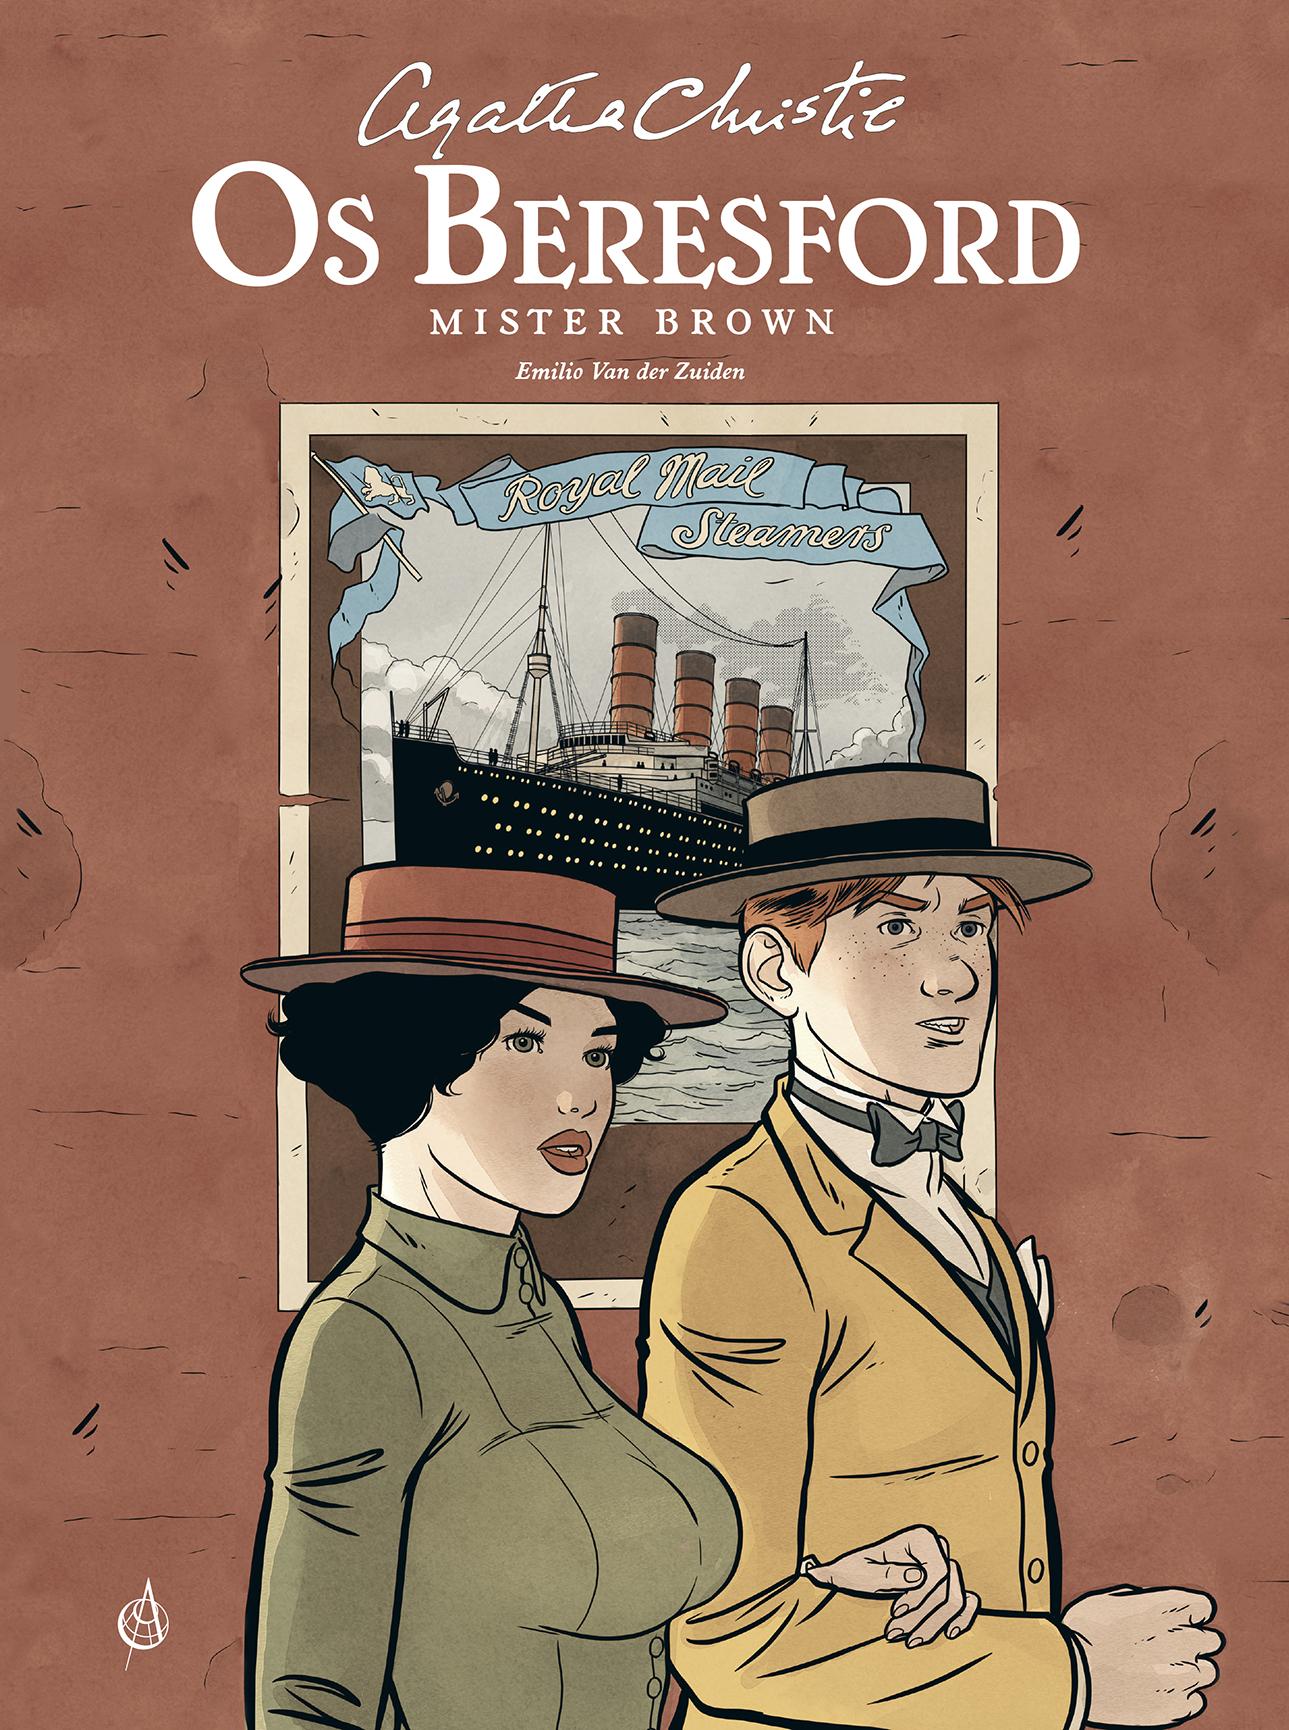 Os Beresford. Agatha Christie. Arte de Autor. Capa